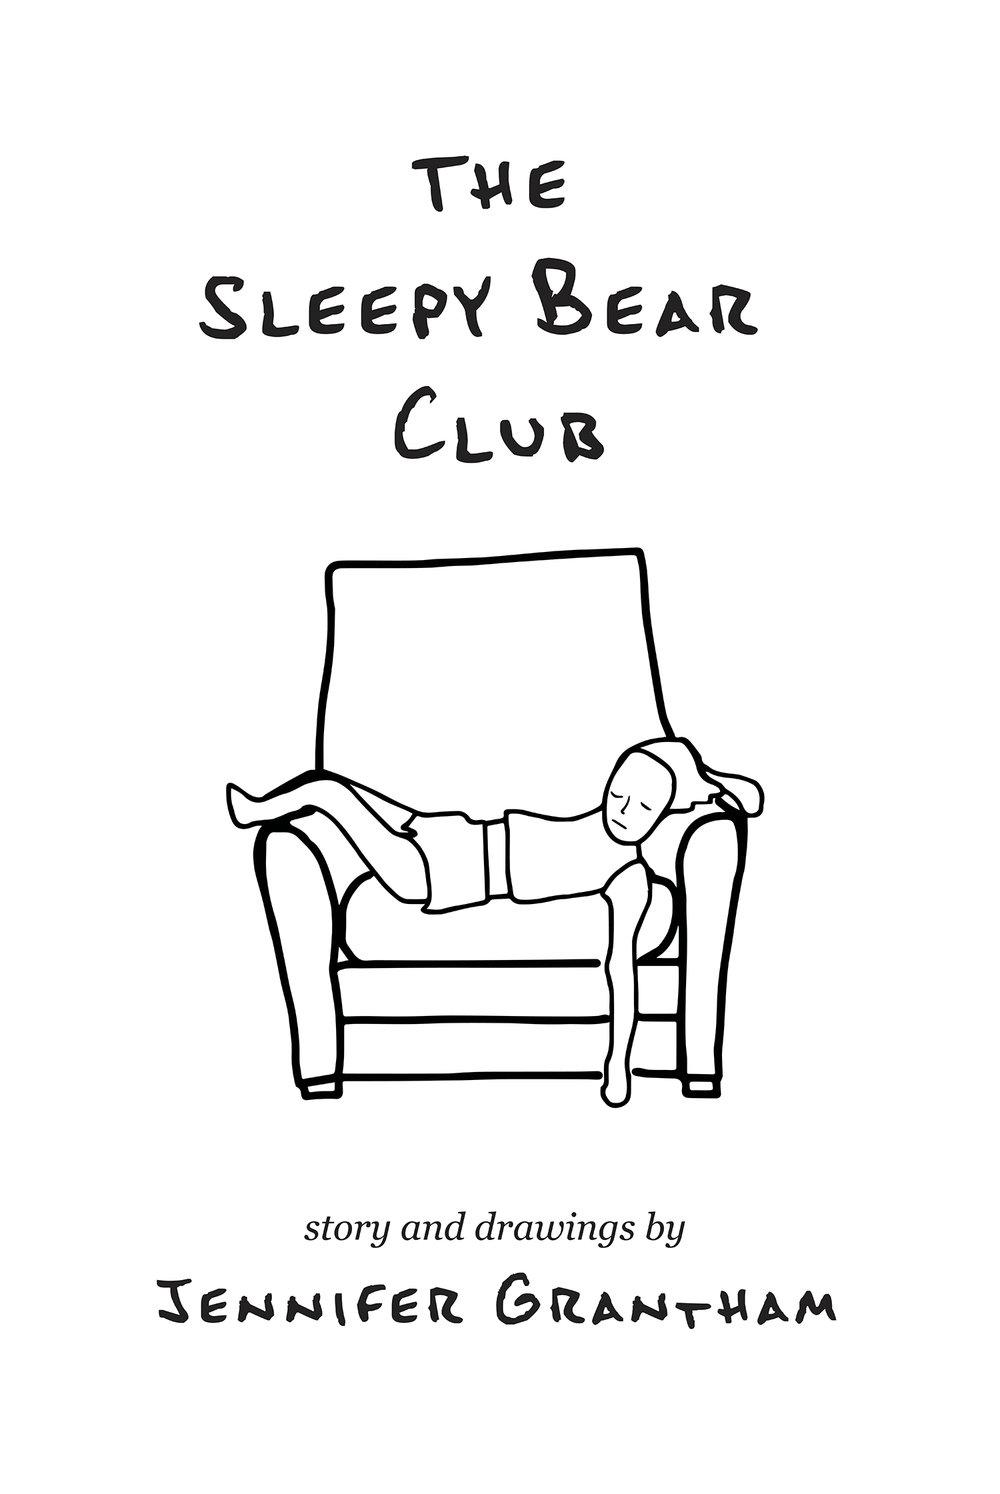 book-cover-art-master_the-sleepy-bear-club.jpg